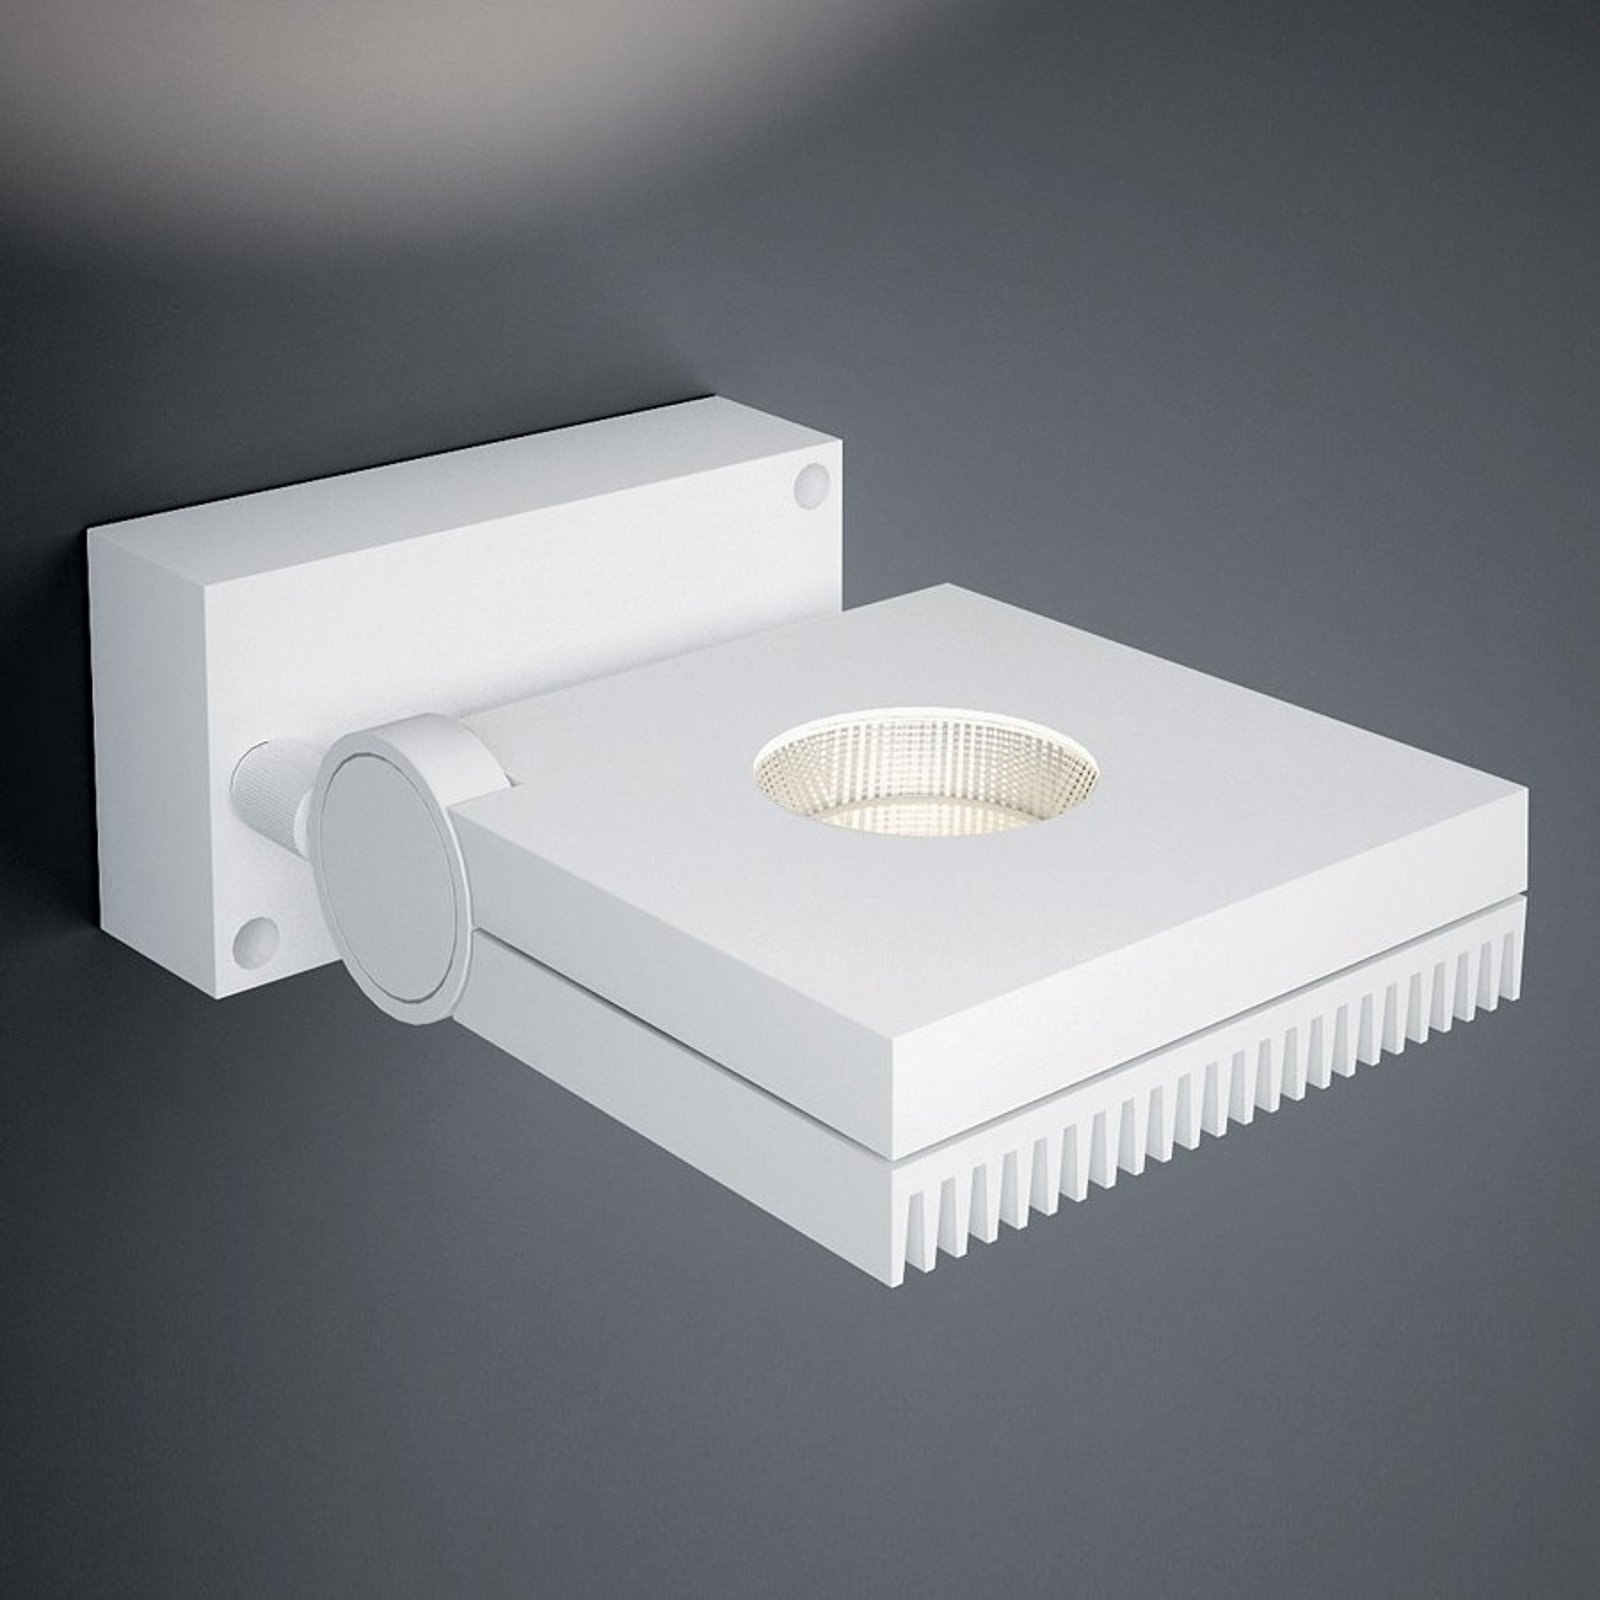 Drei- og svingbar LED-vegglampe Bridge 1 lys